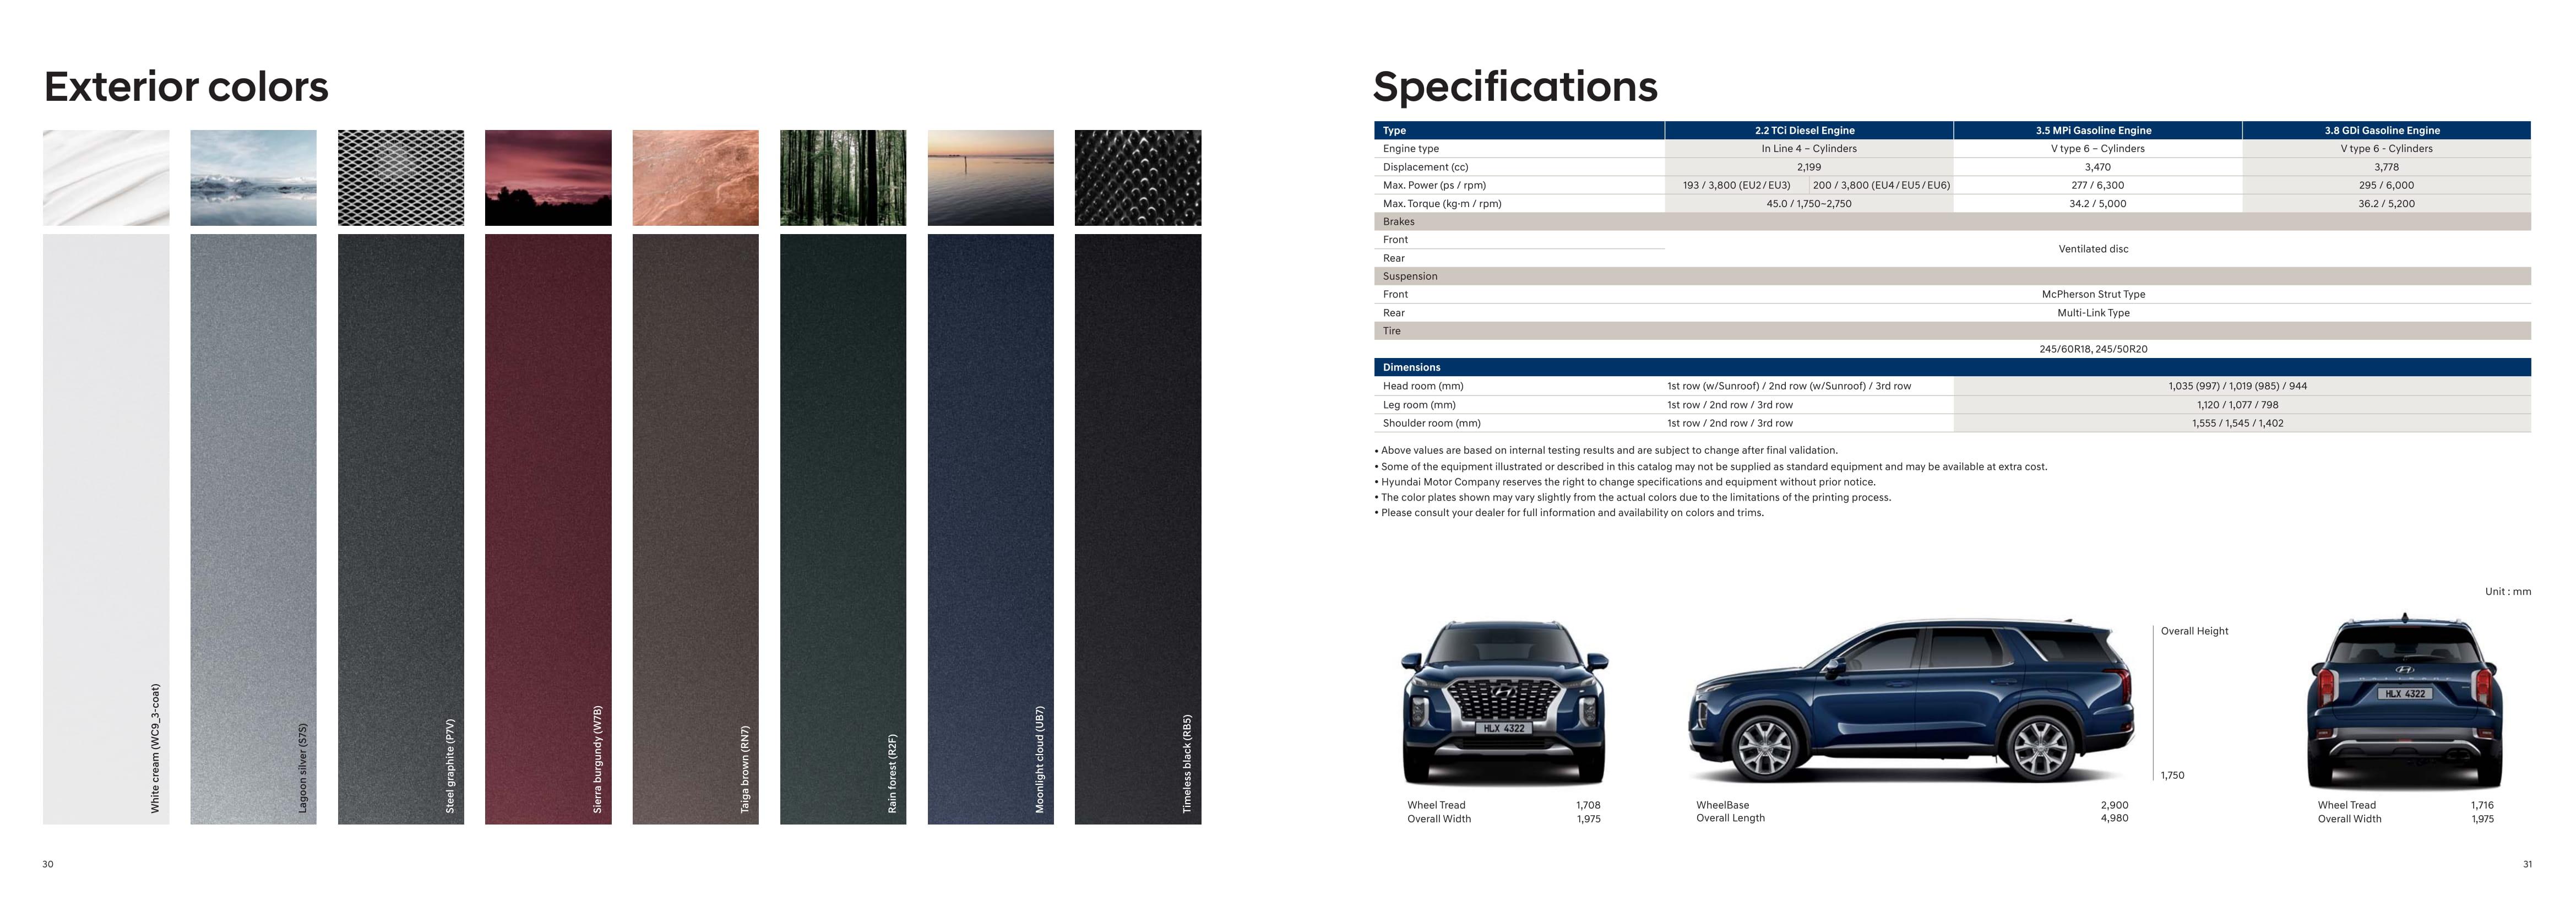 2020-hyundai-palisade-brochure-16 jpg   Hyundai Palisade Forum